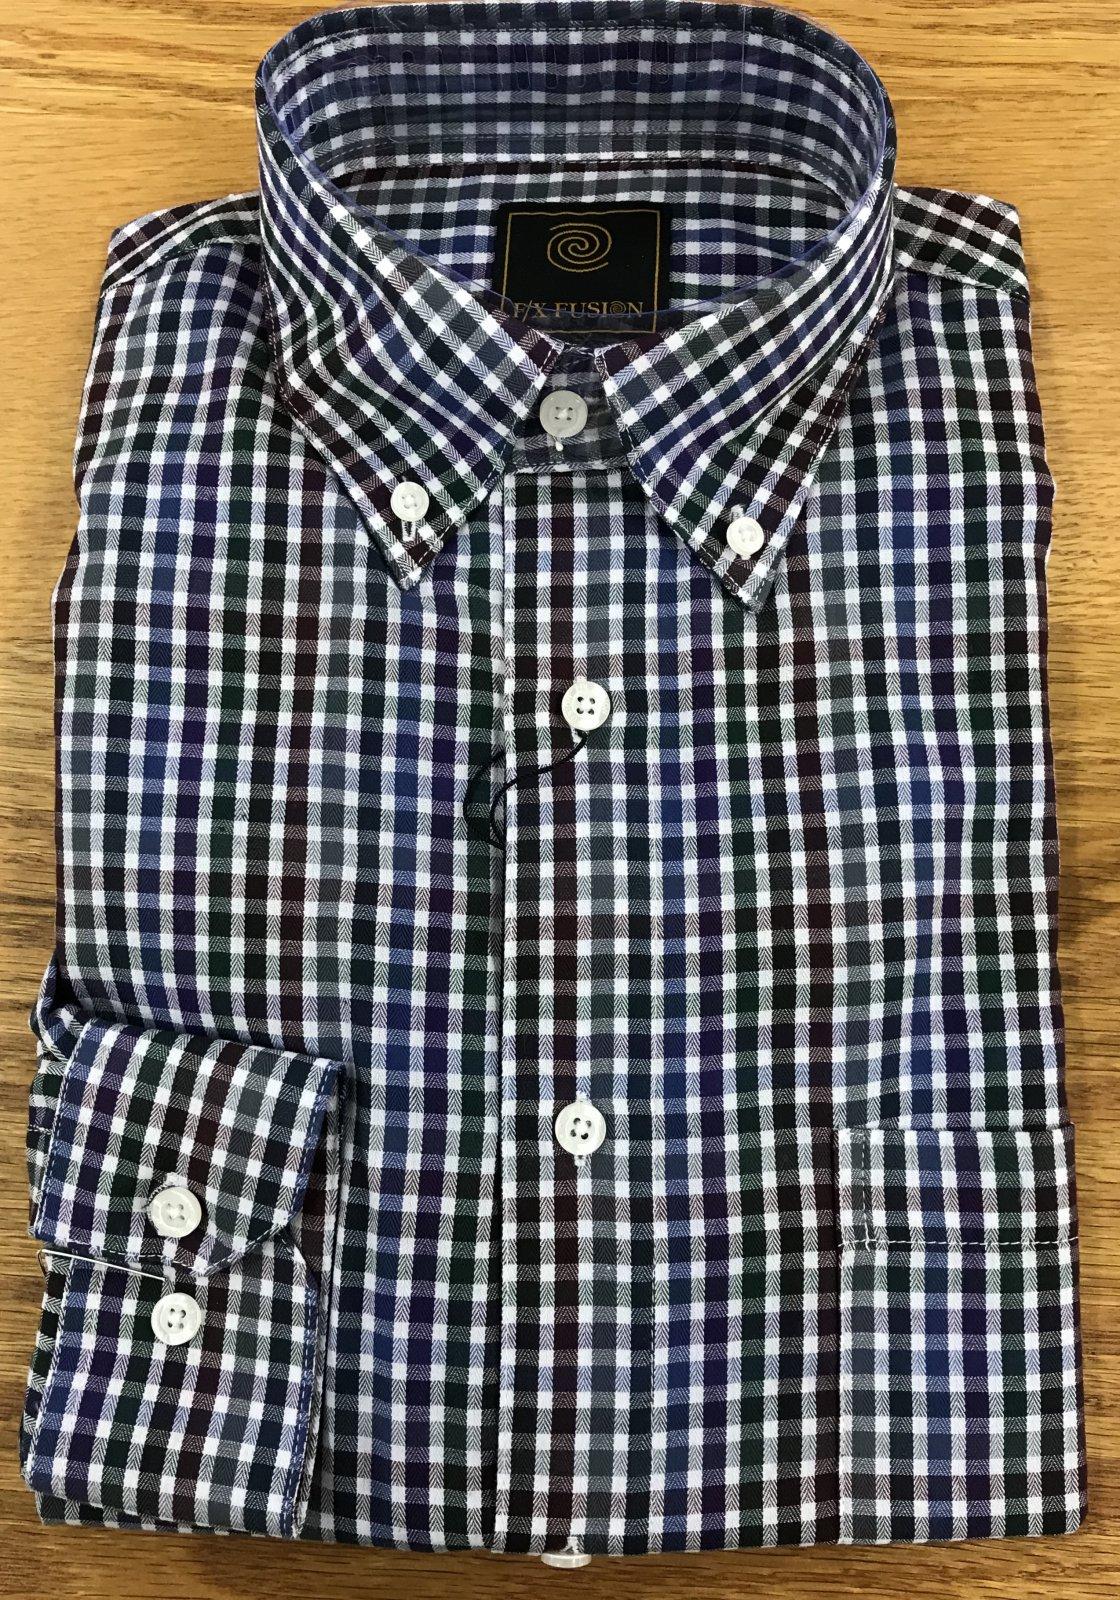 FX Fusion LS Olive Multi Sportshirt